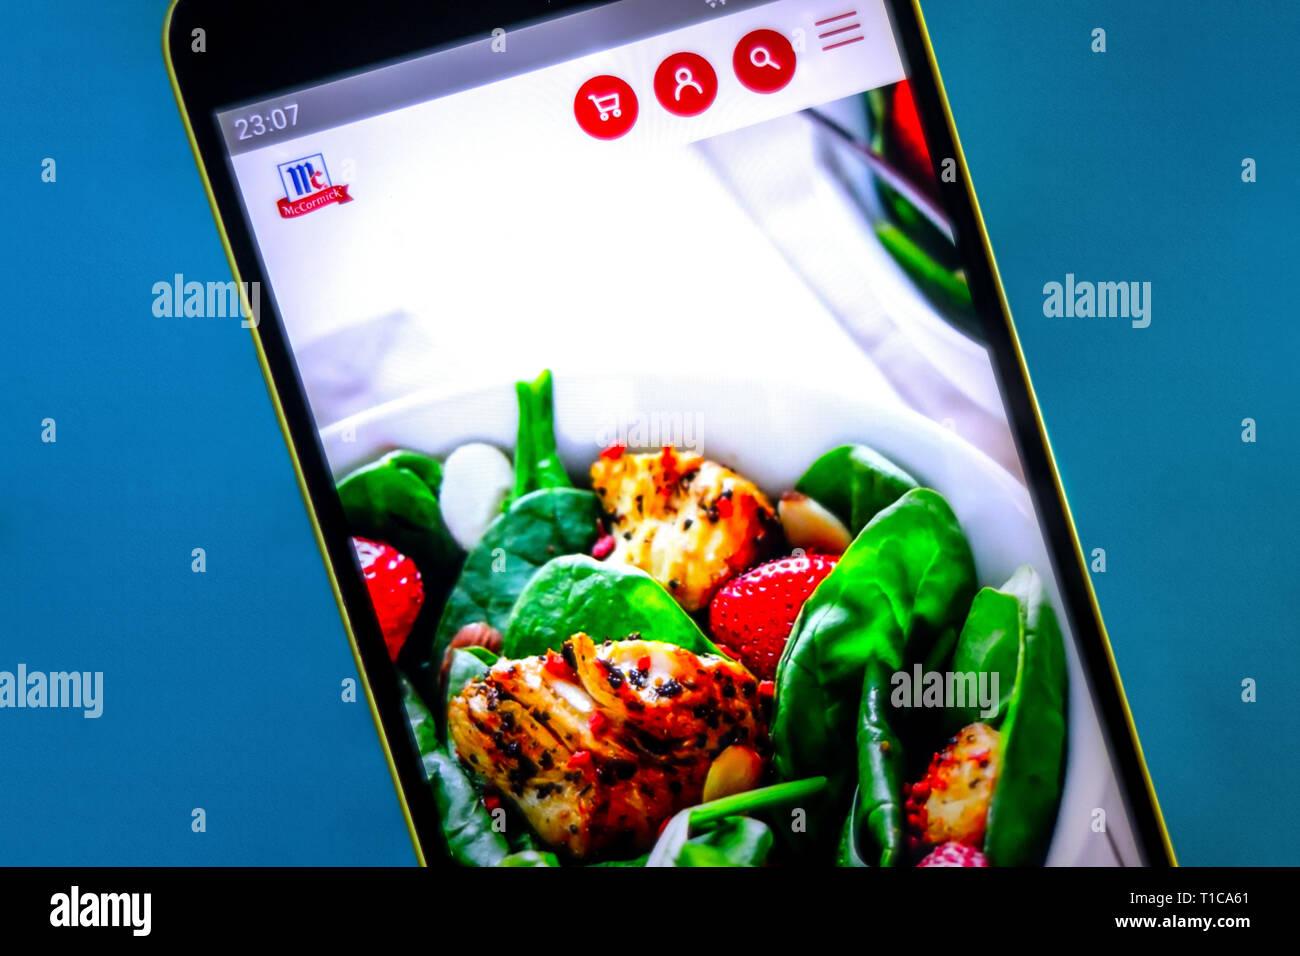 Berdyansk, Ukraine - März 24, 2019: Illustrative Editorial, McCormick Homepage. McCormick Logo sichtbar auf dem Bildschirm des Telefons. Stockbild